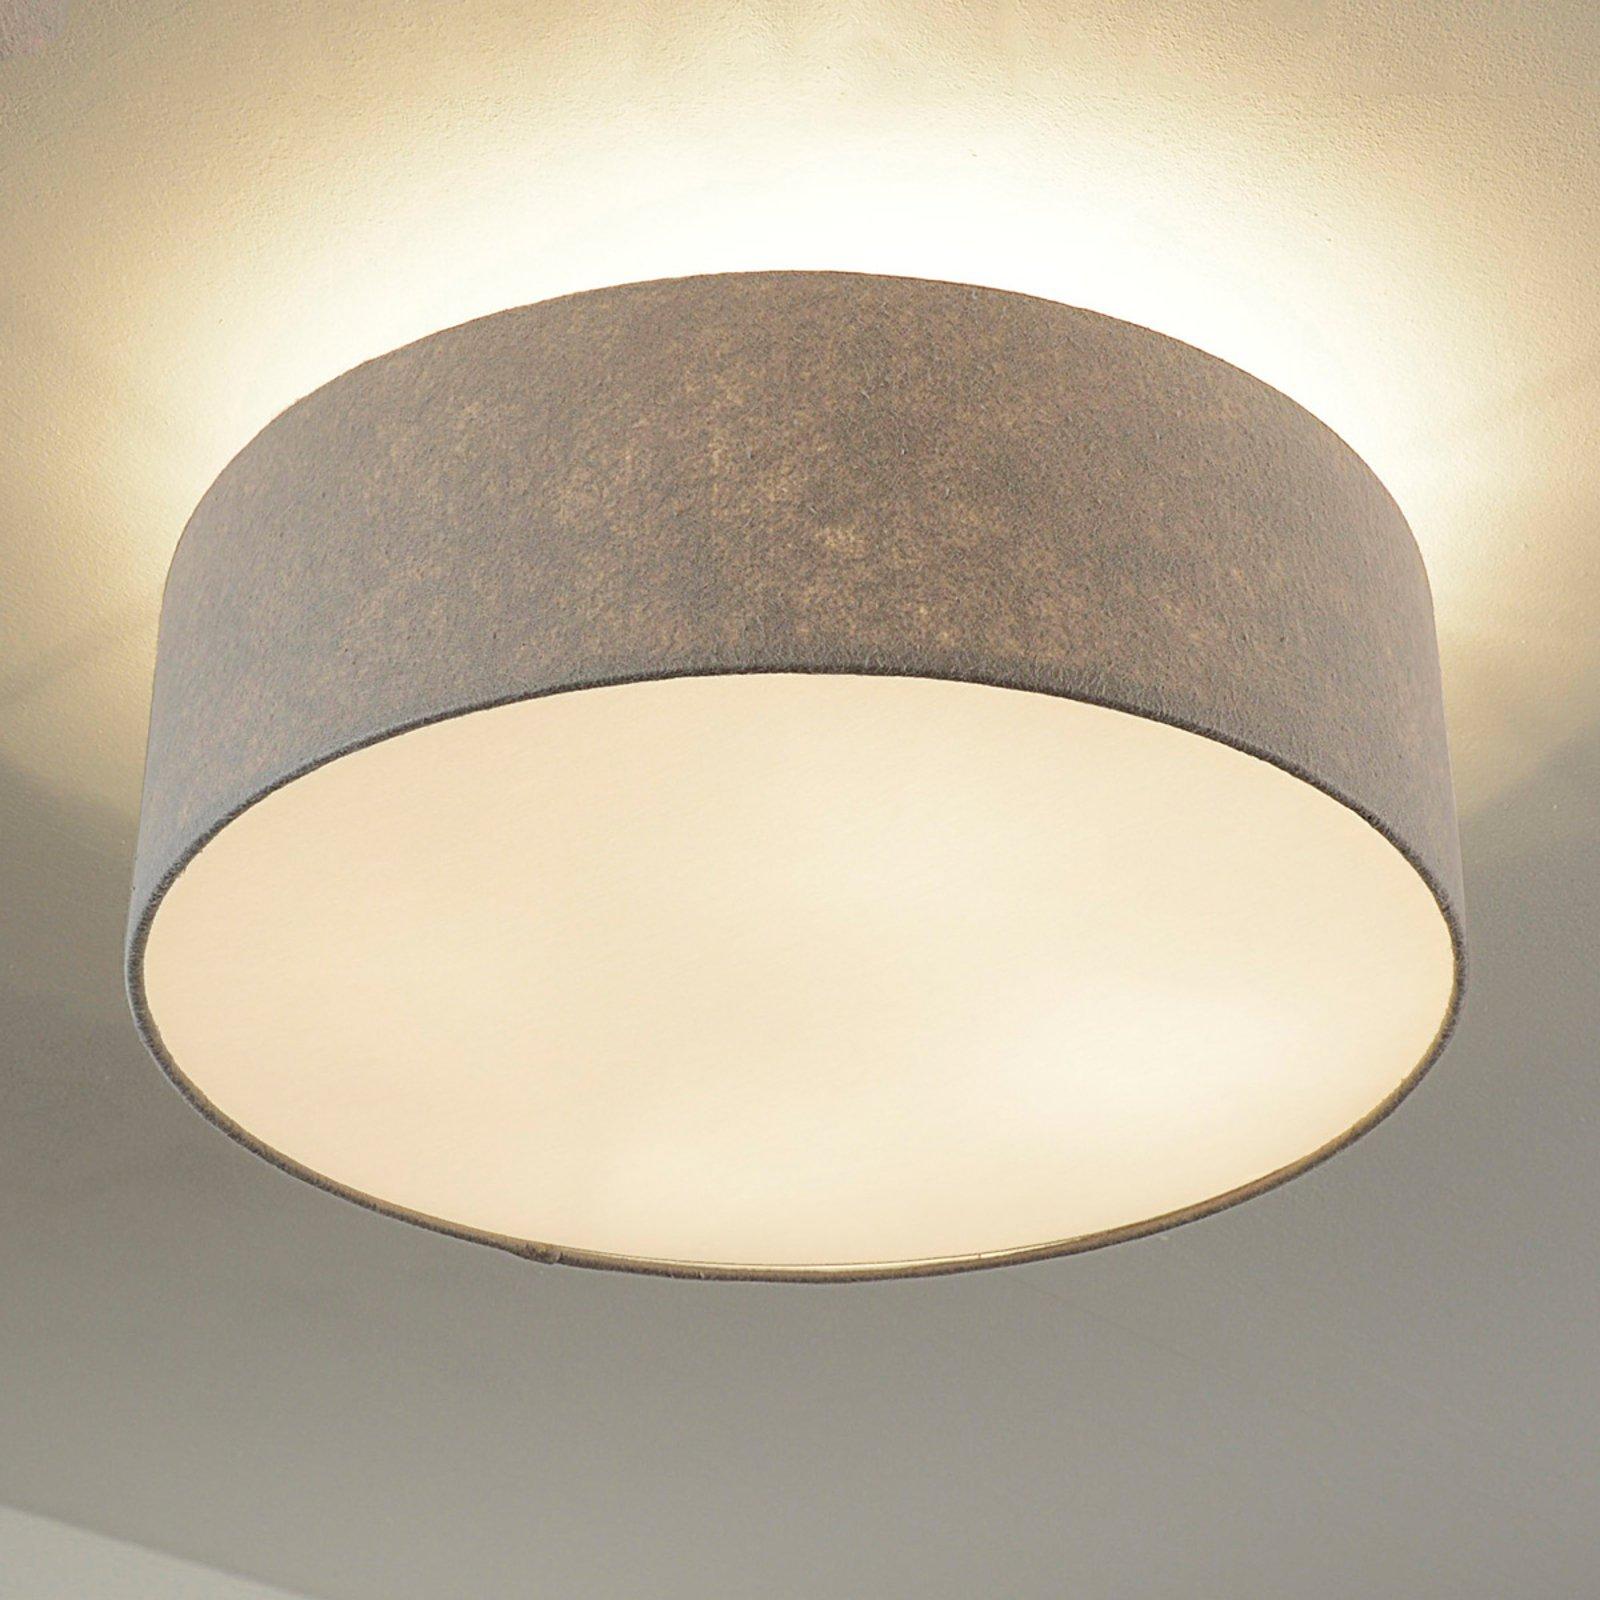 Taklampe,Gala, 50 cm, filtskjerm grå